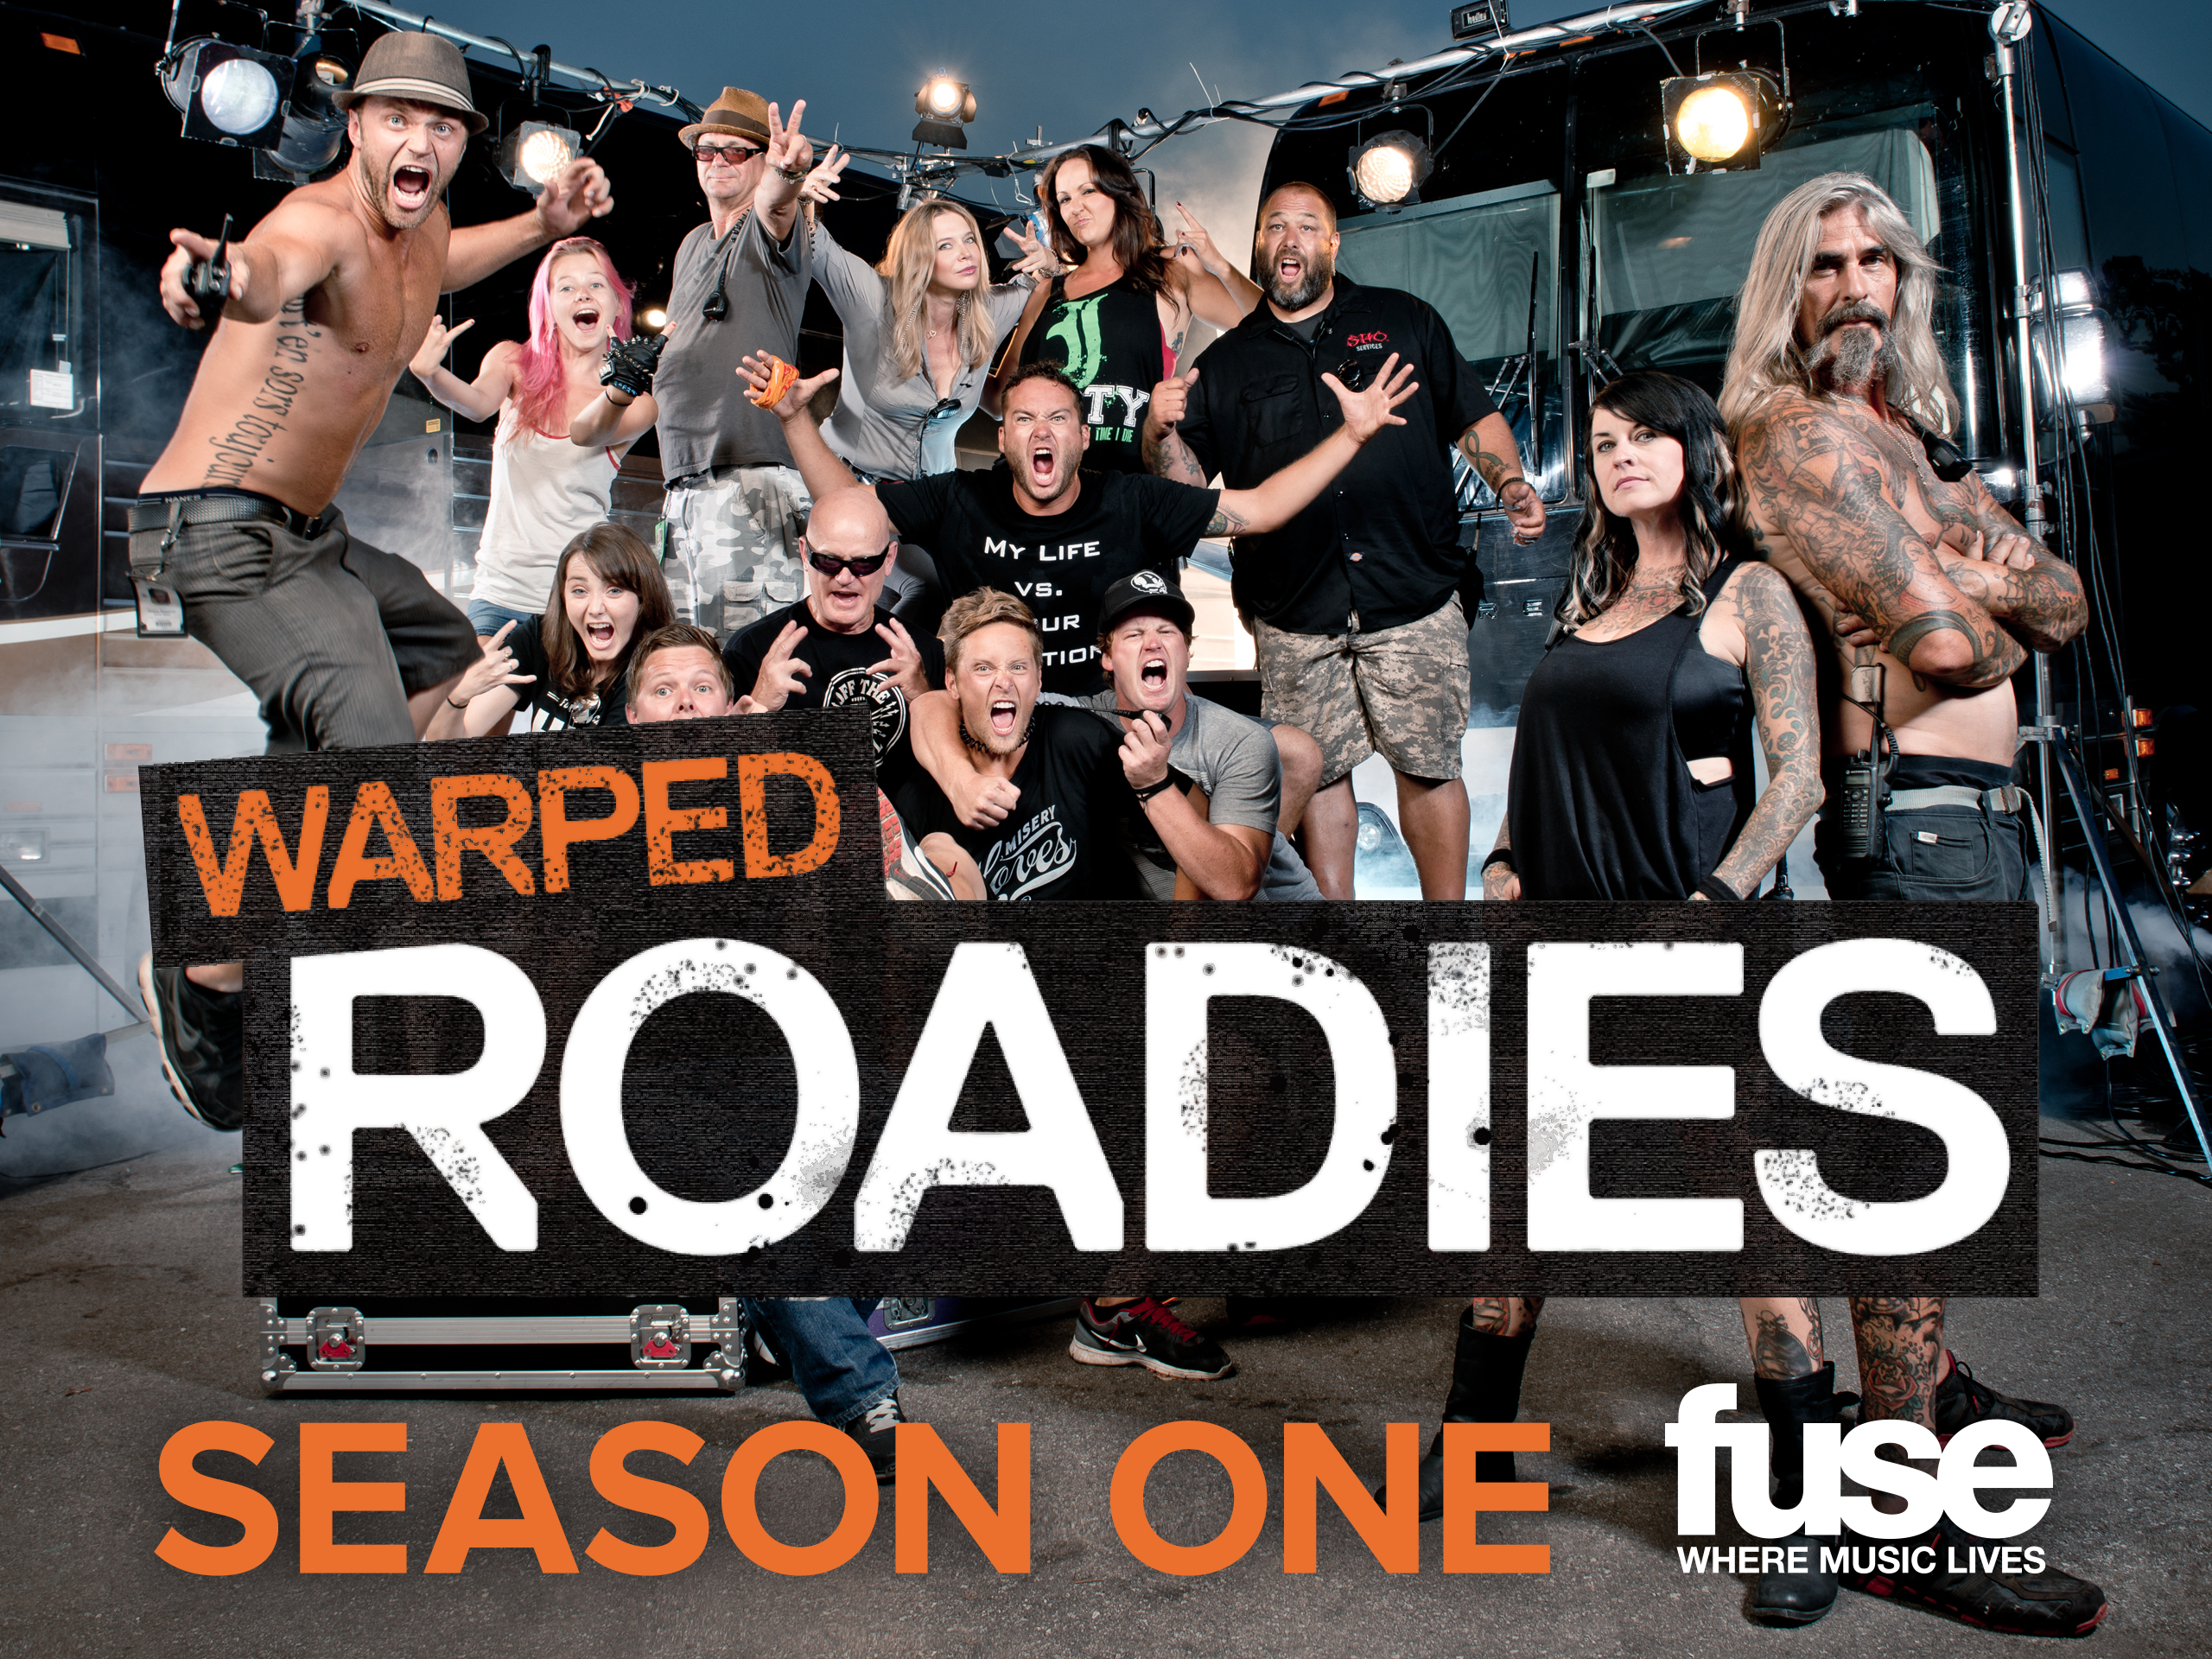 Tv Guide Montreal >> Watch Warped Roadies Season 1 Episode 4 Montreal On Fuse 2013